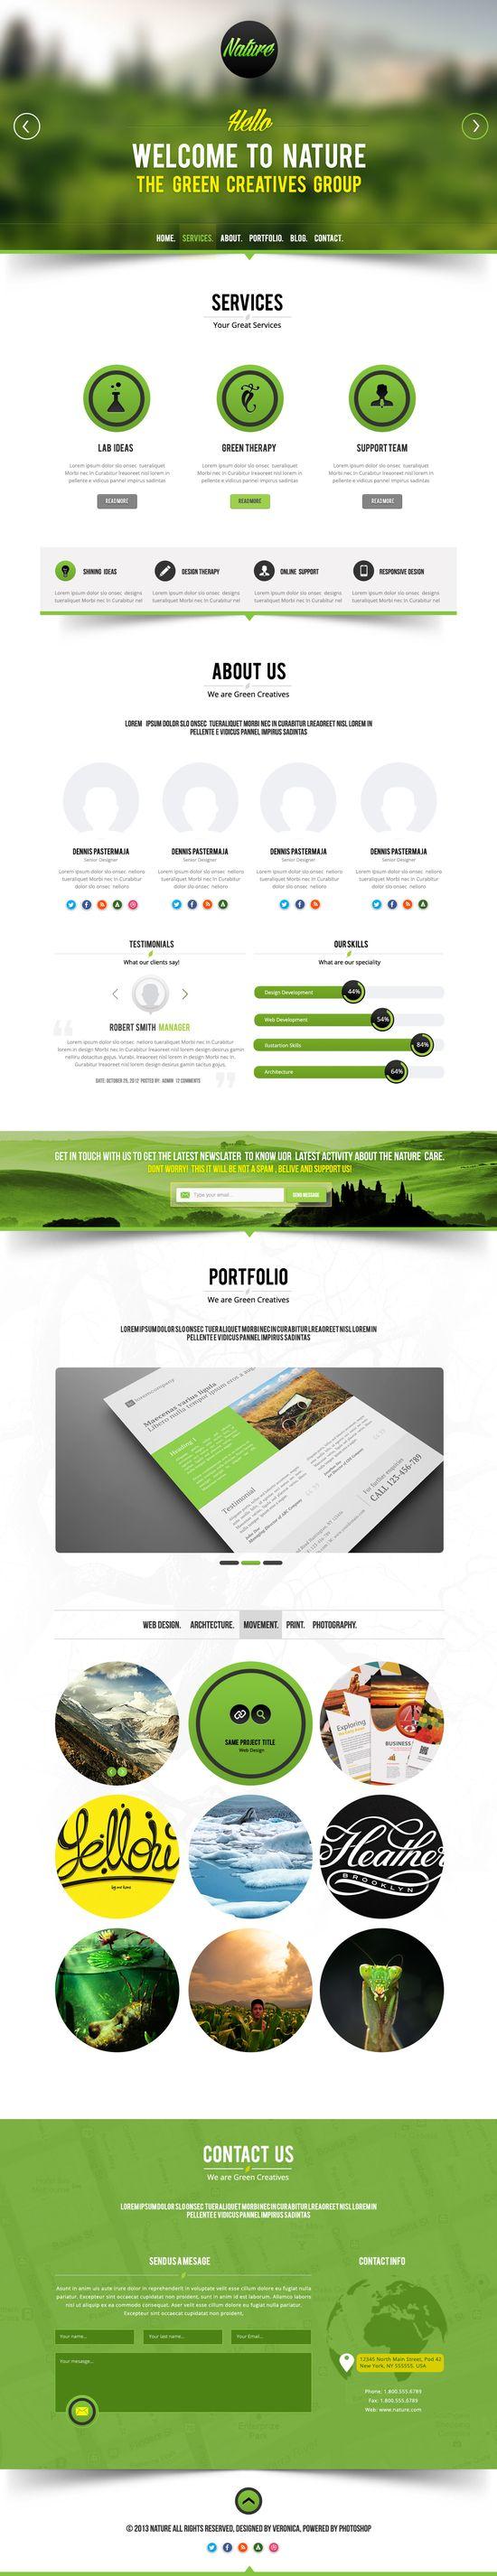 Nature web design